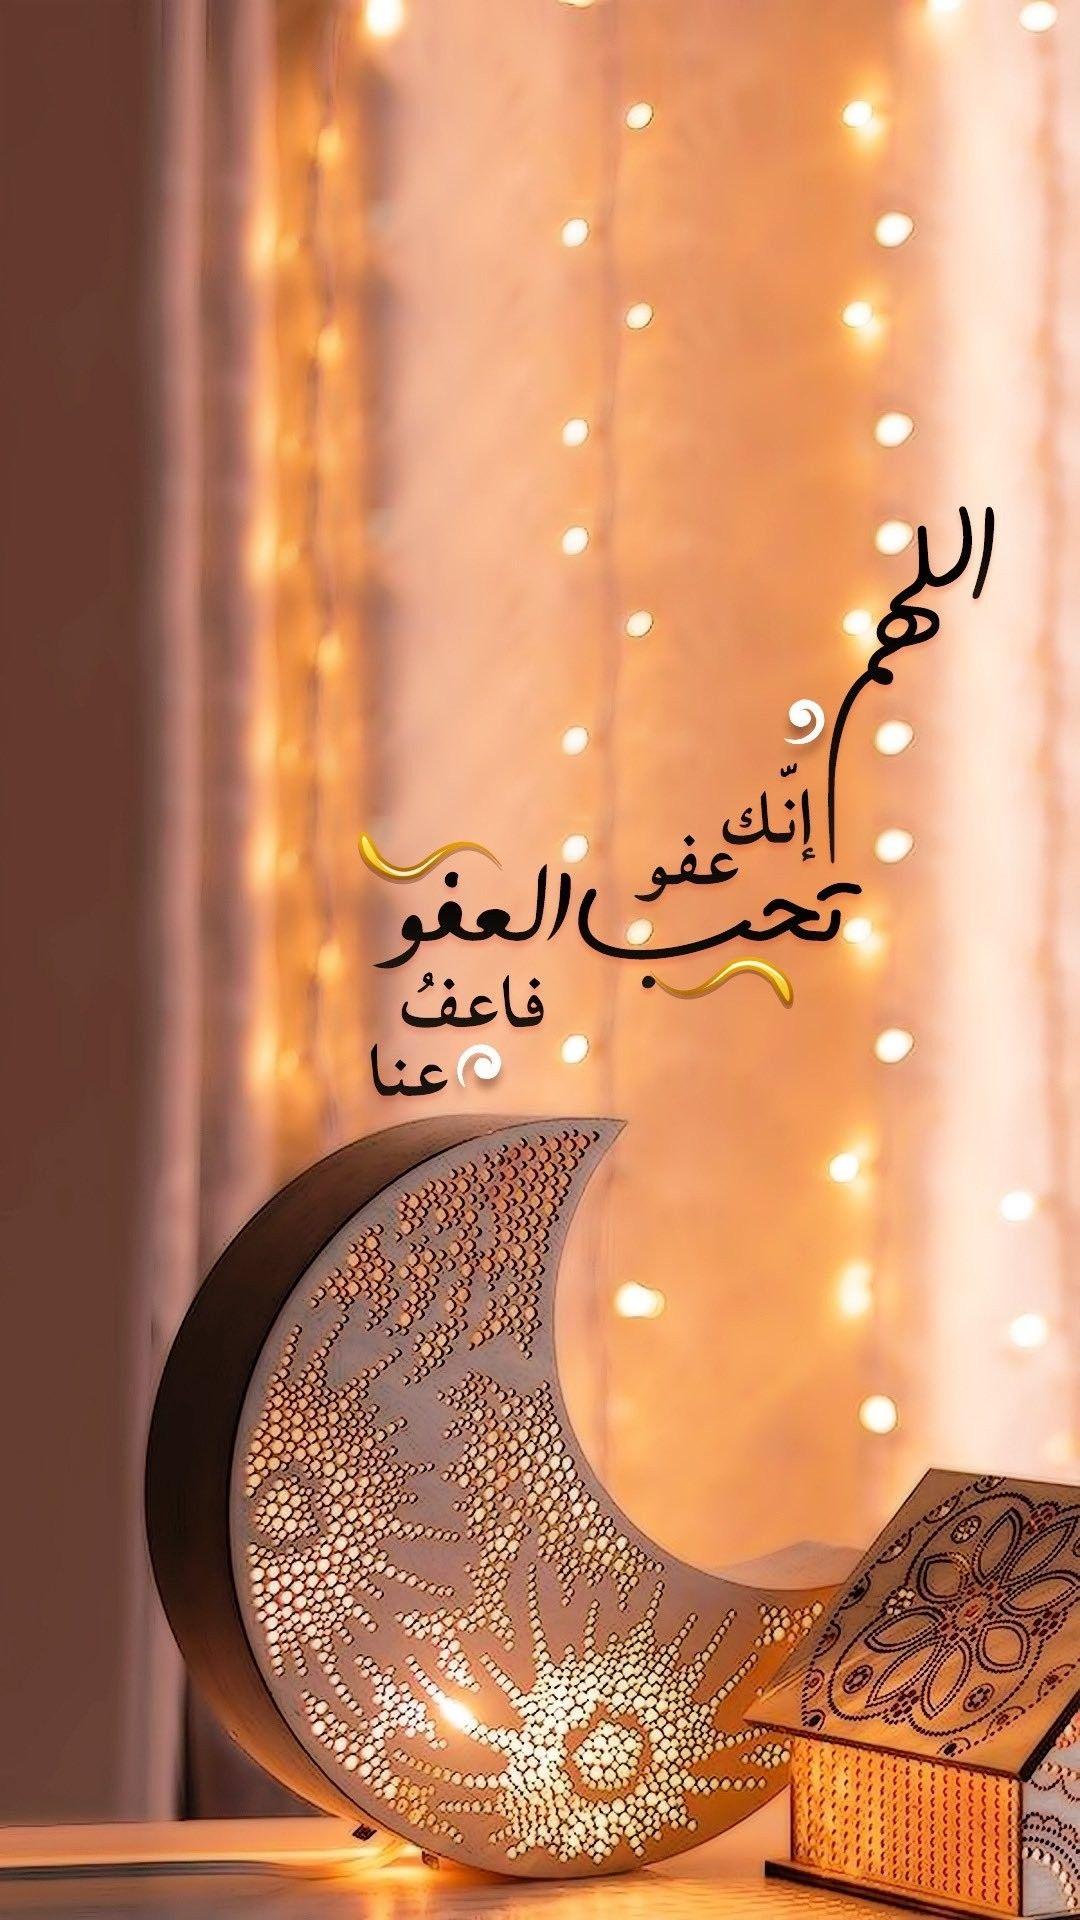 Pin By زهرة النرجس On رمضان In 2021 Ramadan Quotes Islamic Quotes Wallpaper Ramadan Images